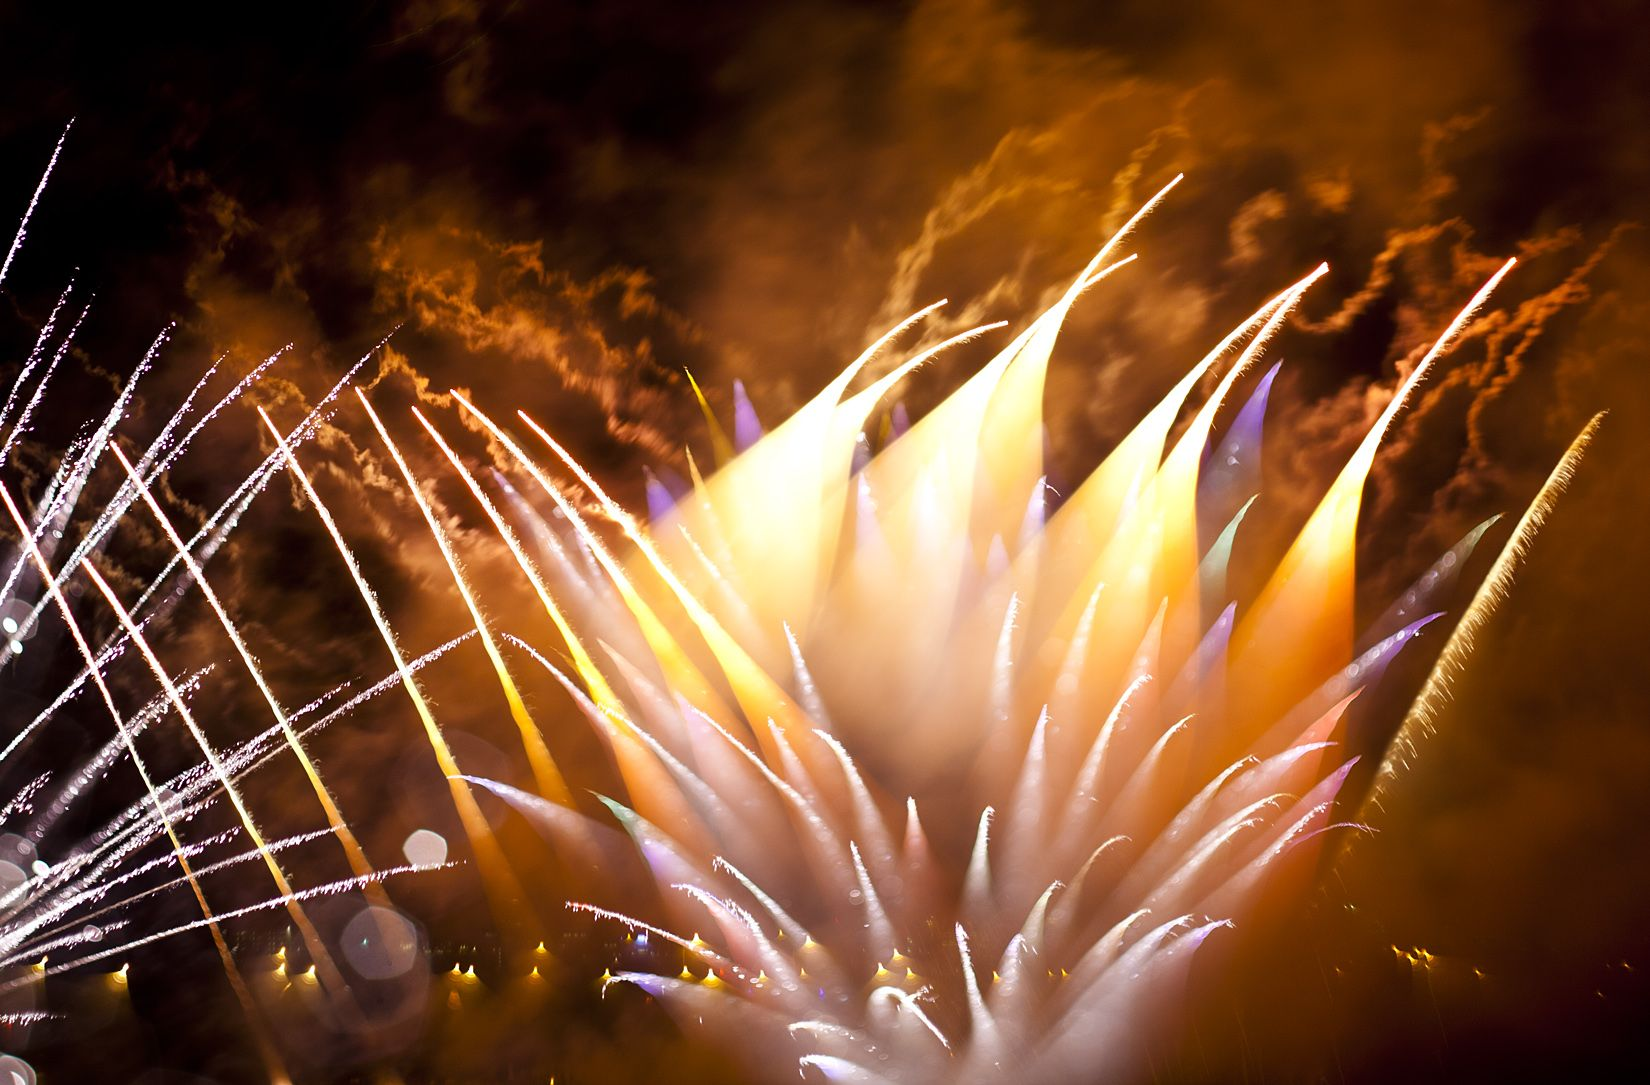 Long Exposure Fireworks Like You've Never Seen Before